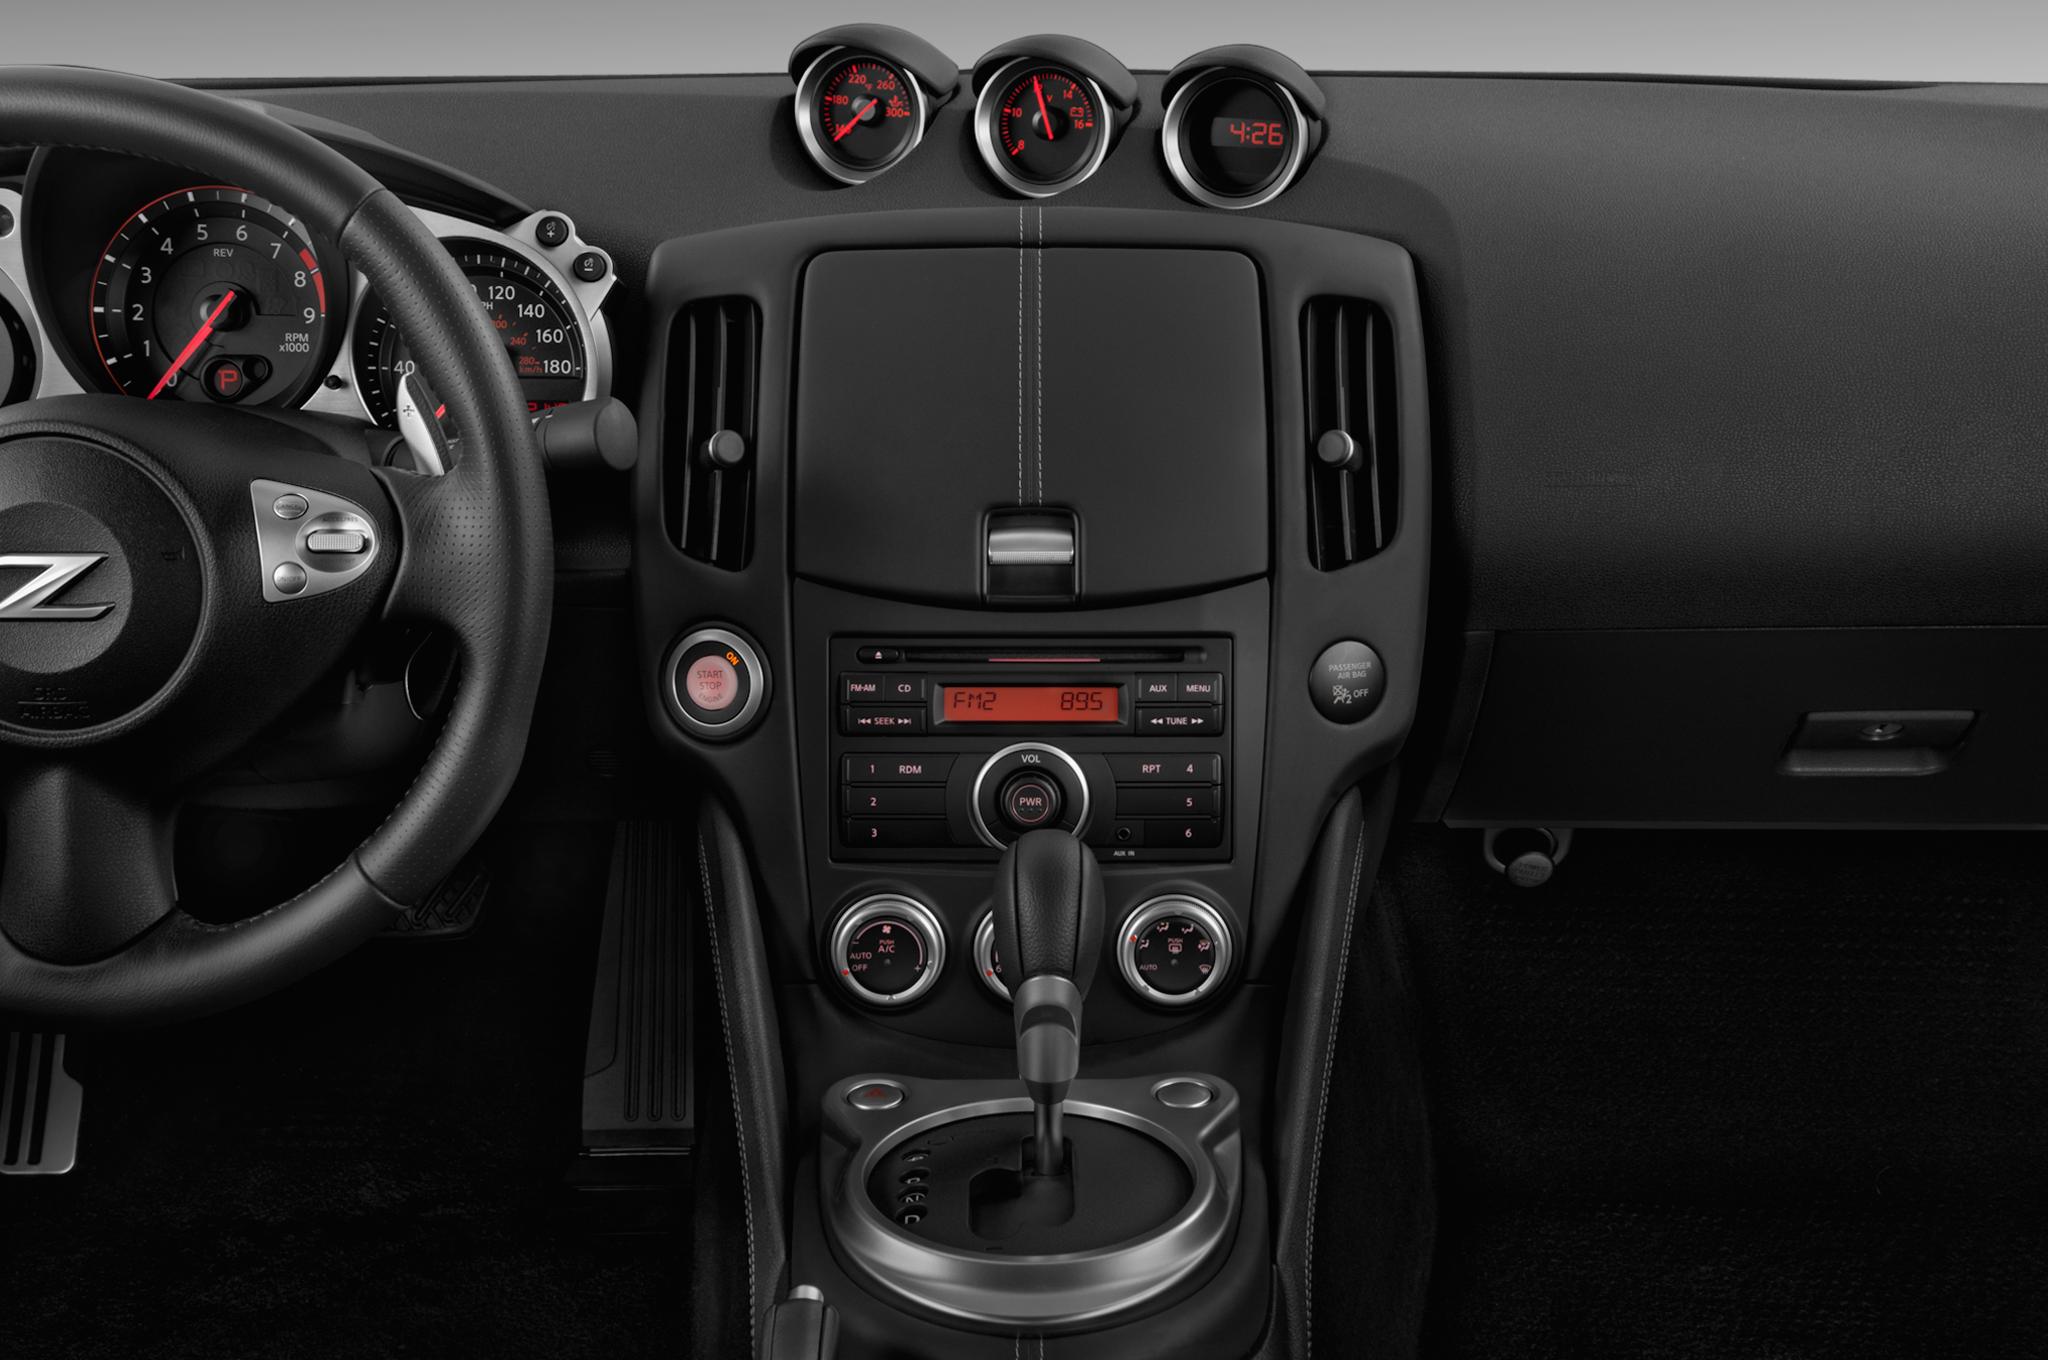 2016 nissan 370z interior. 4950 2016 nissan 370z interior